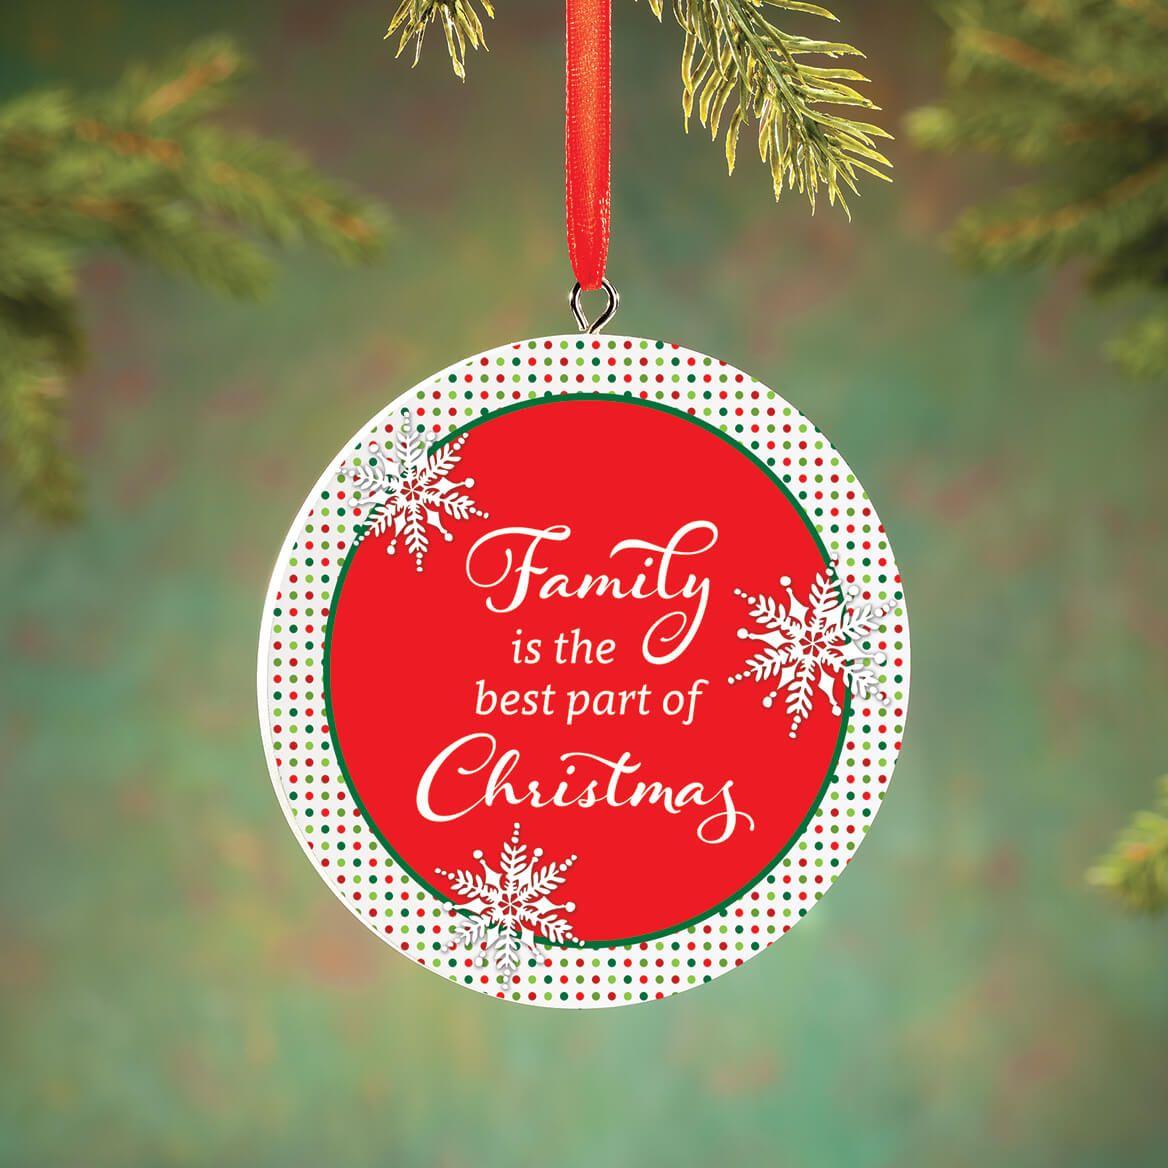 Personalized Polka Dot Family Christmas Ornament-372721